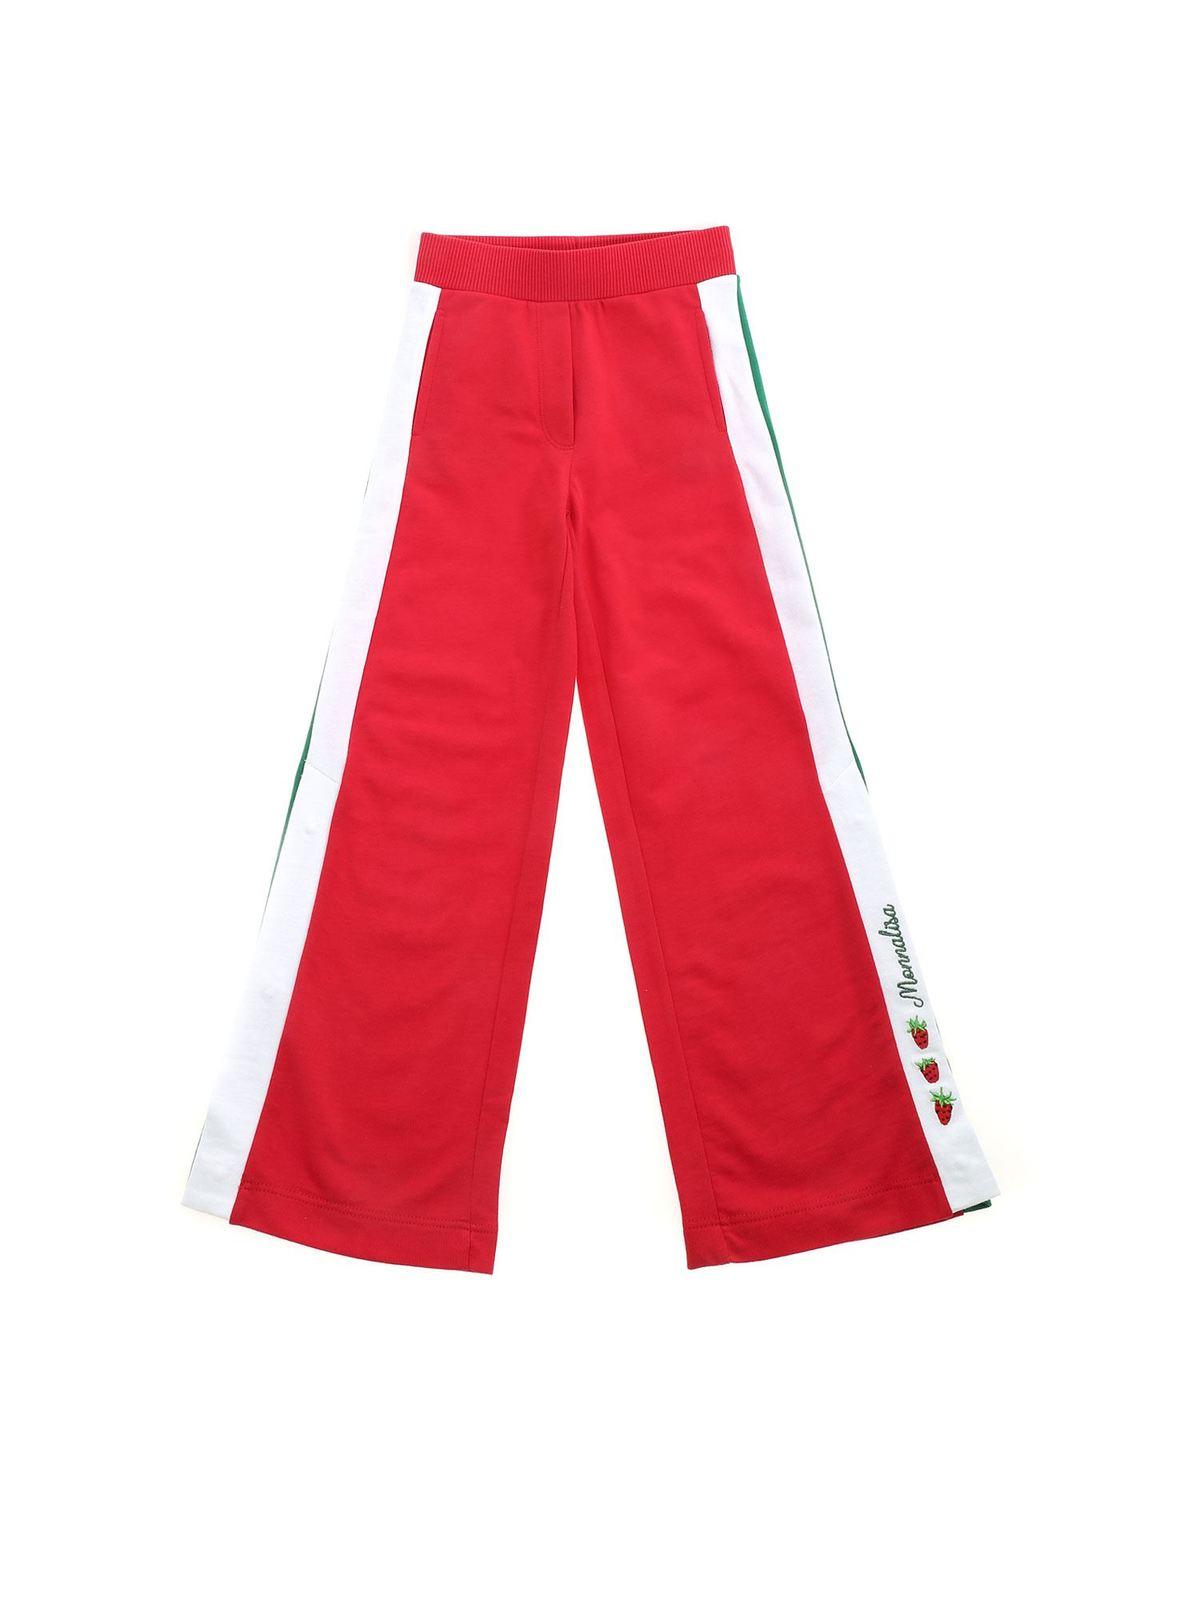 Monnalisa SIDE OPENING PANTS IN RED